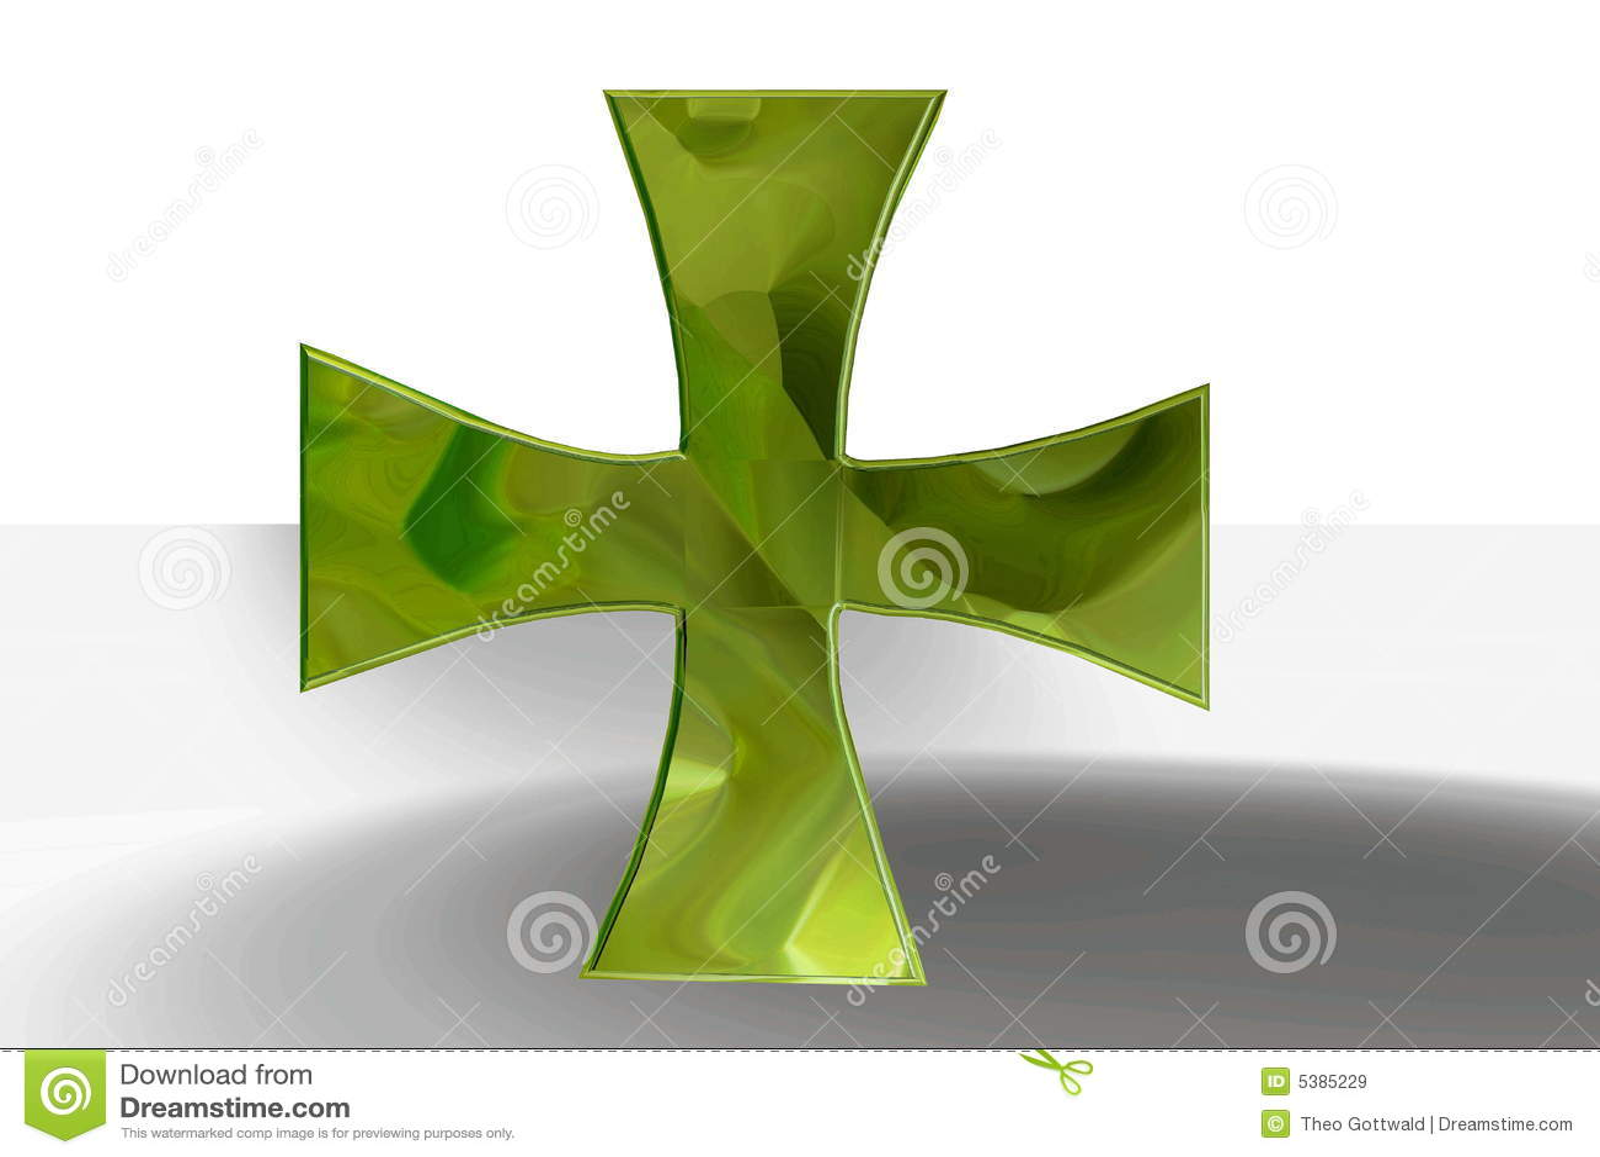 Christian views on environmentalism